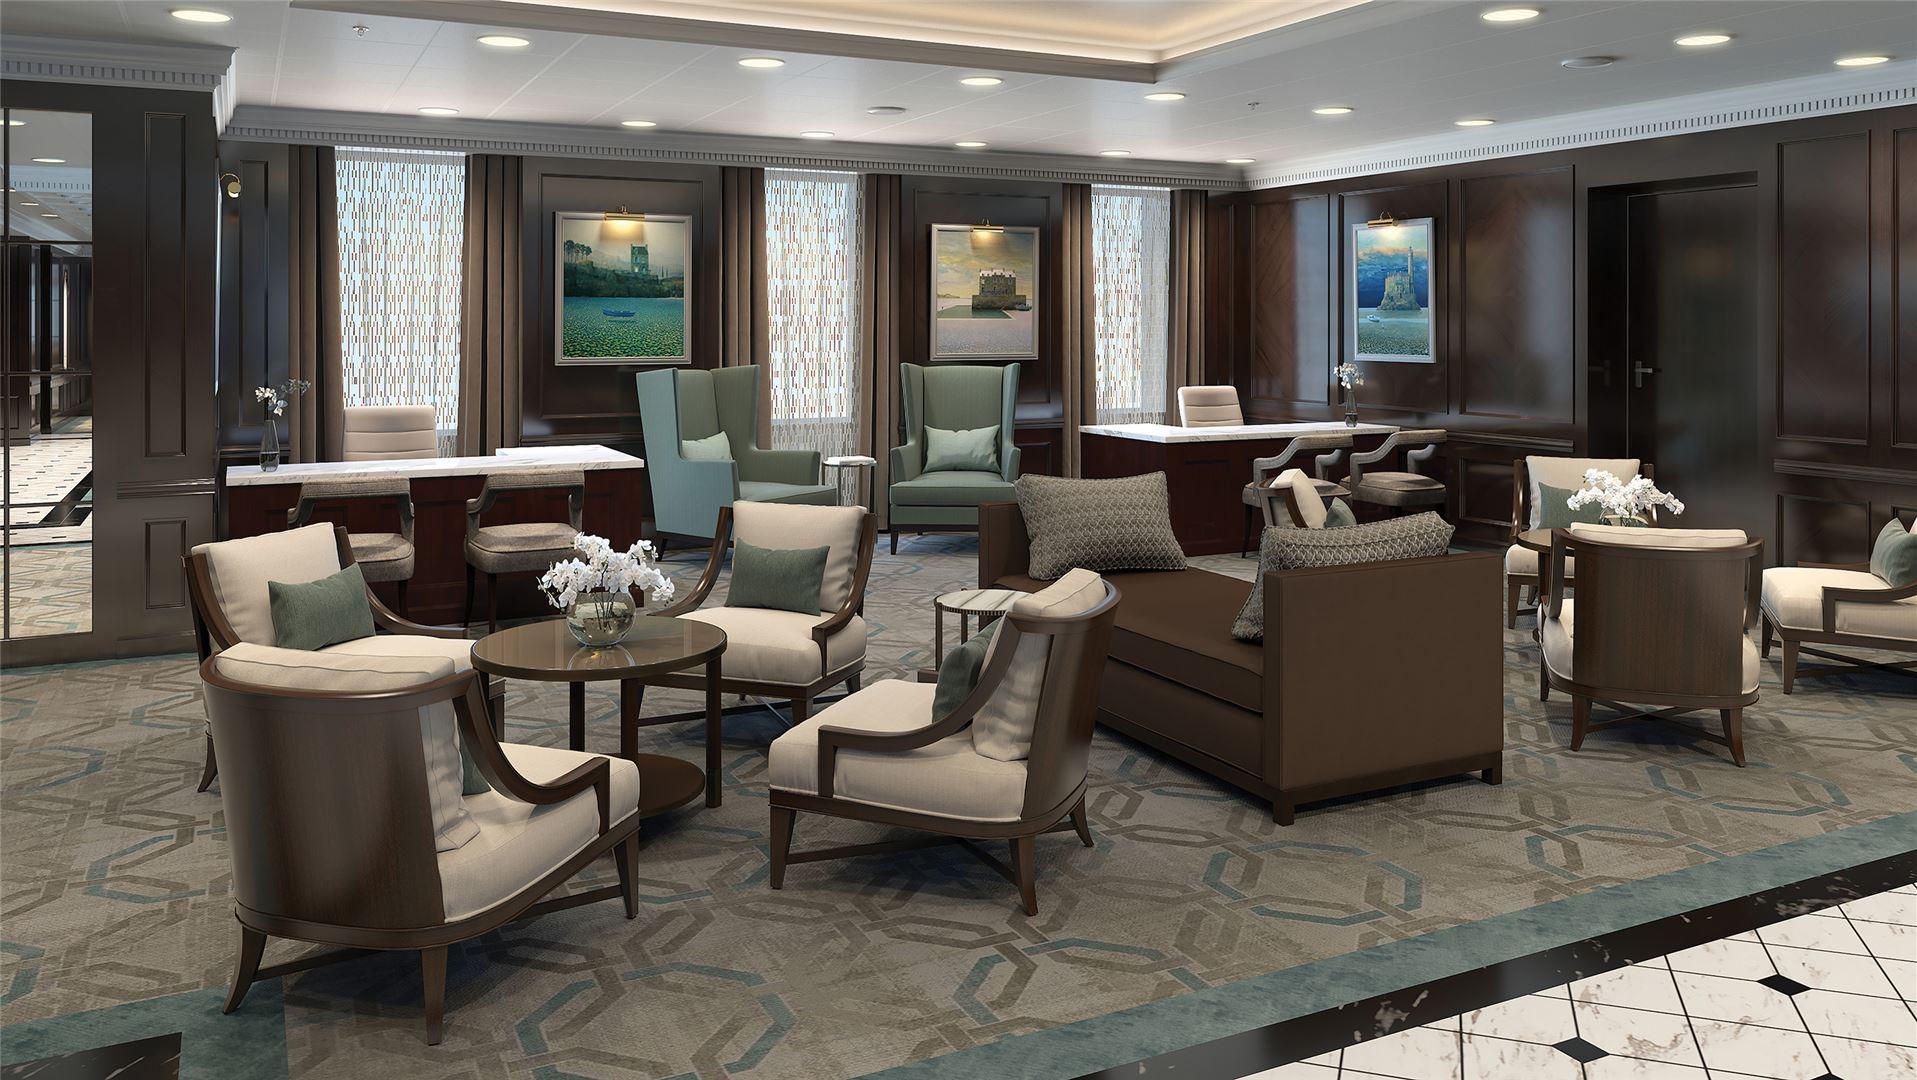 Penthouse Suite of the reimagined Regatta-Class ships